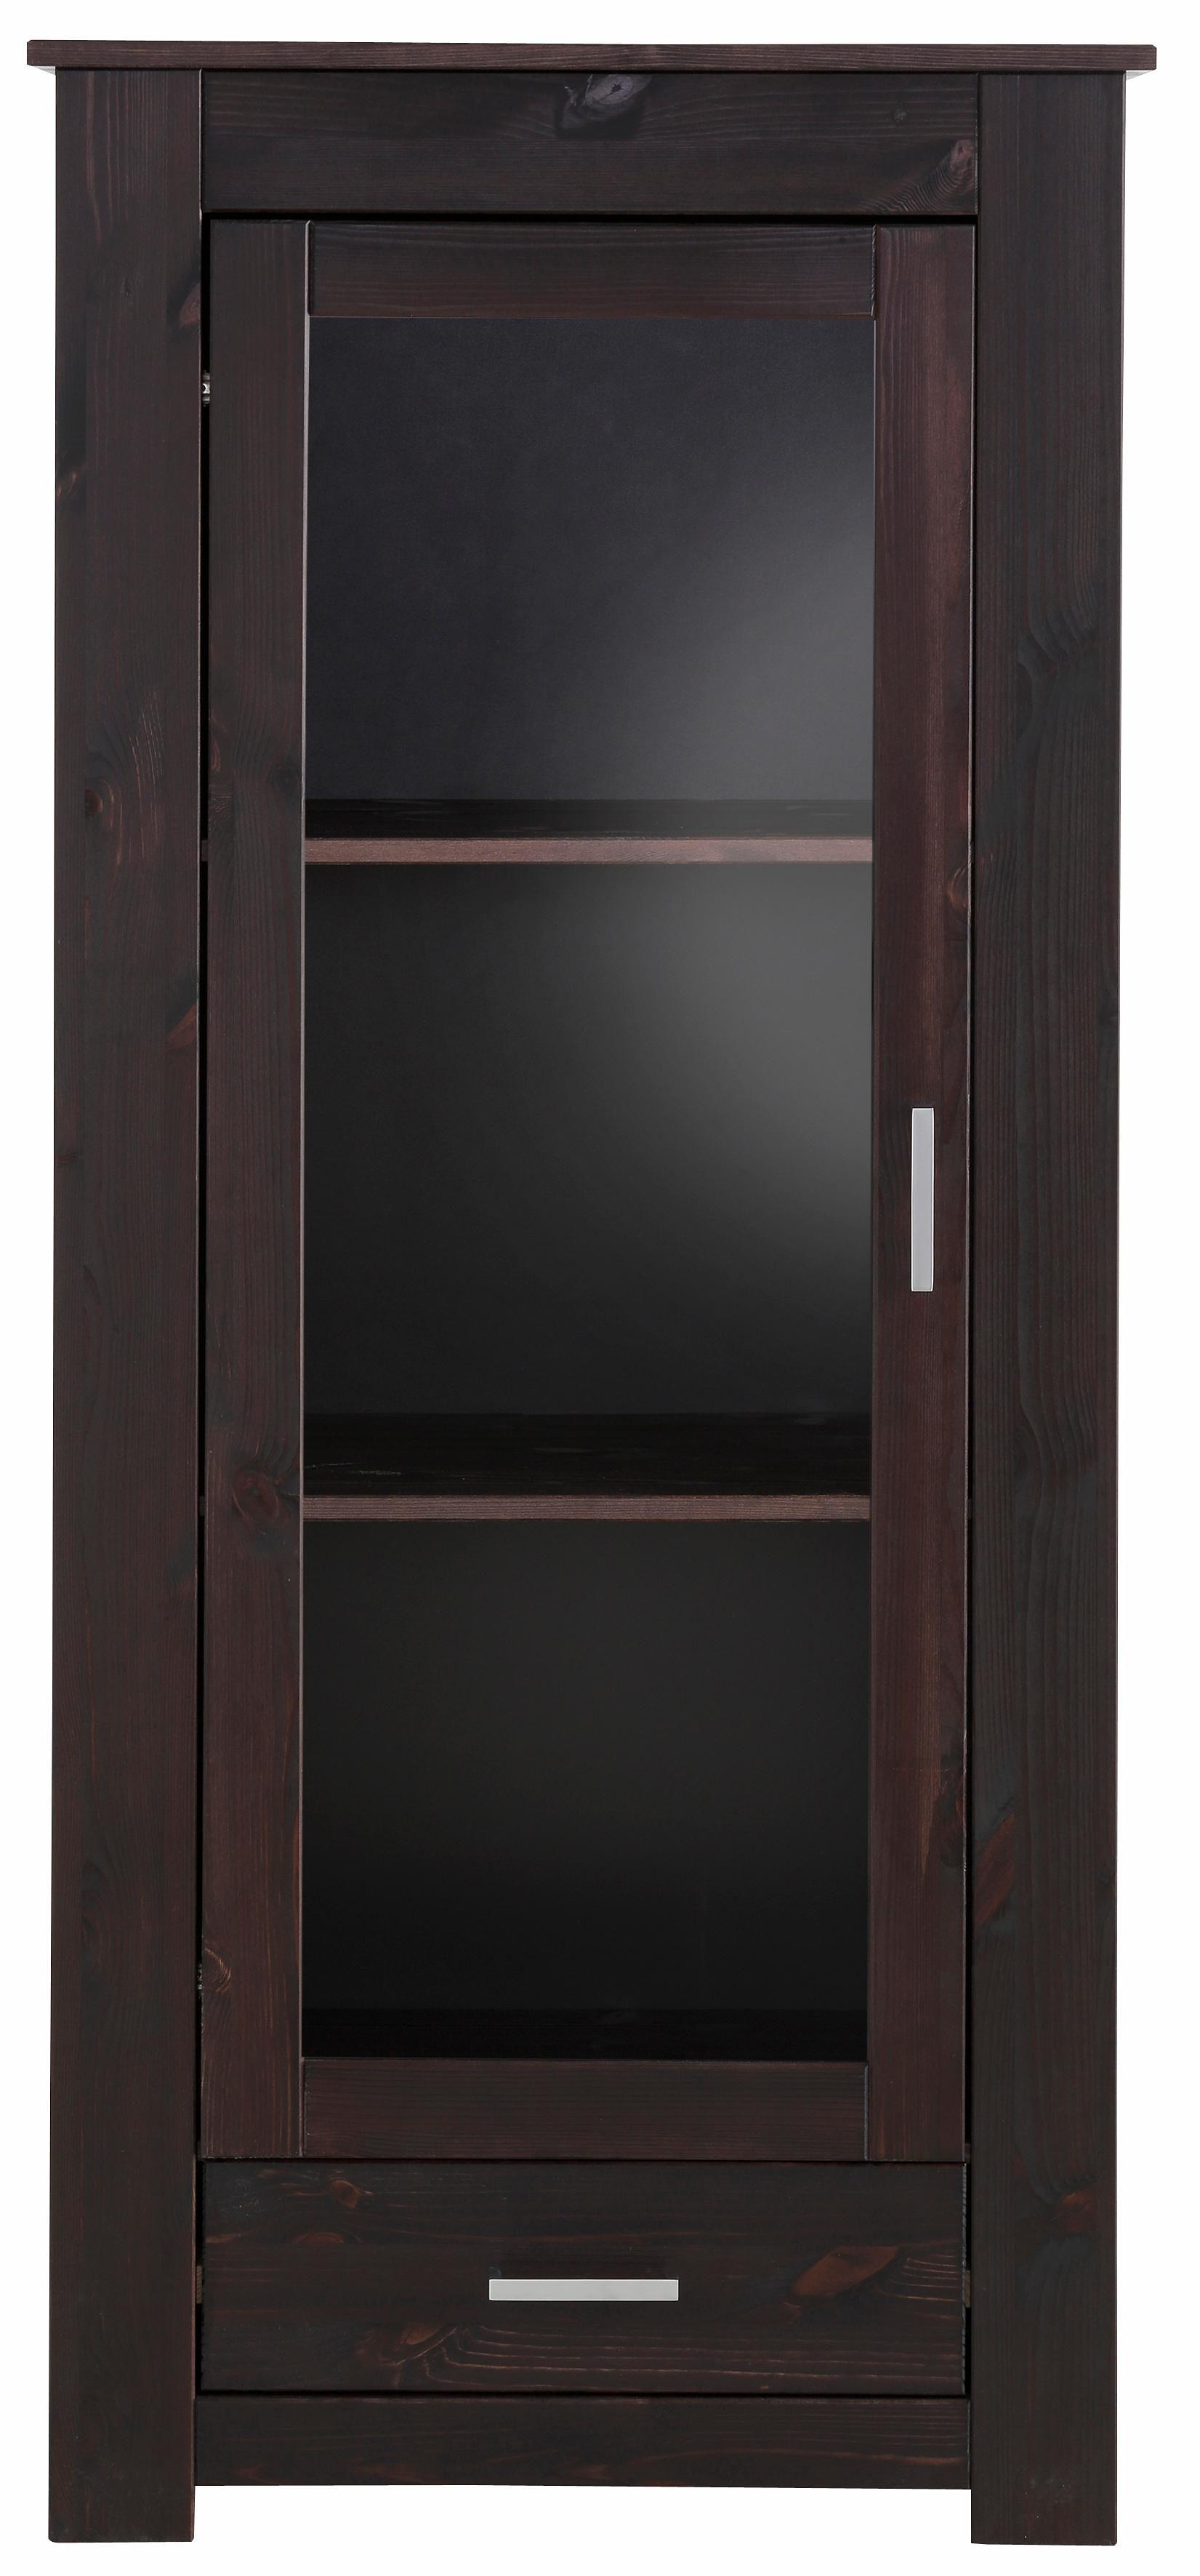 Home affaire Vitrine »Benton«, Höhe 140 cm